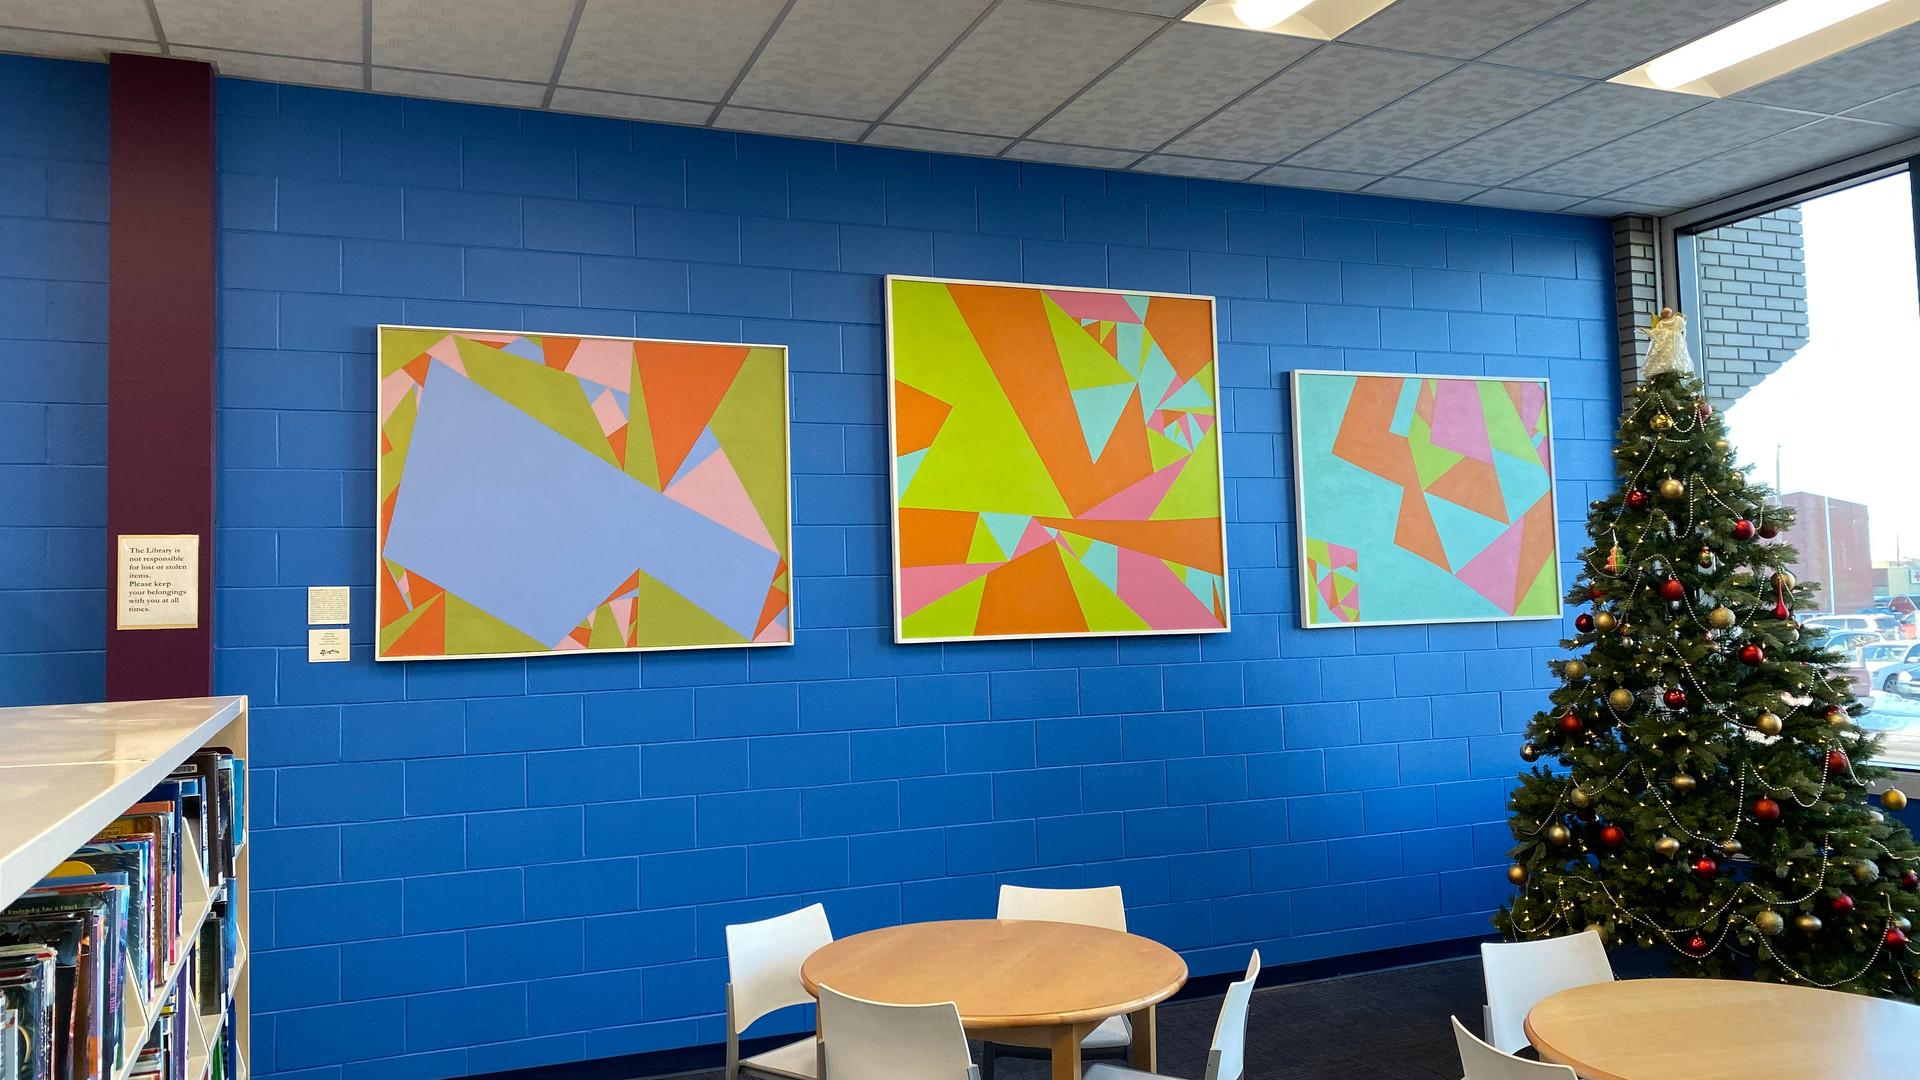 Mina Forsyth Paintings at JMCPL